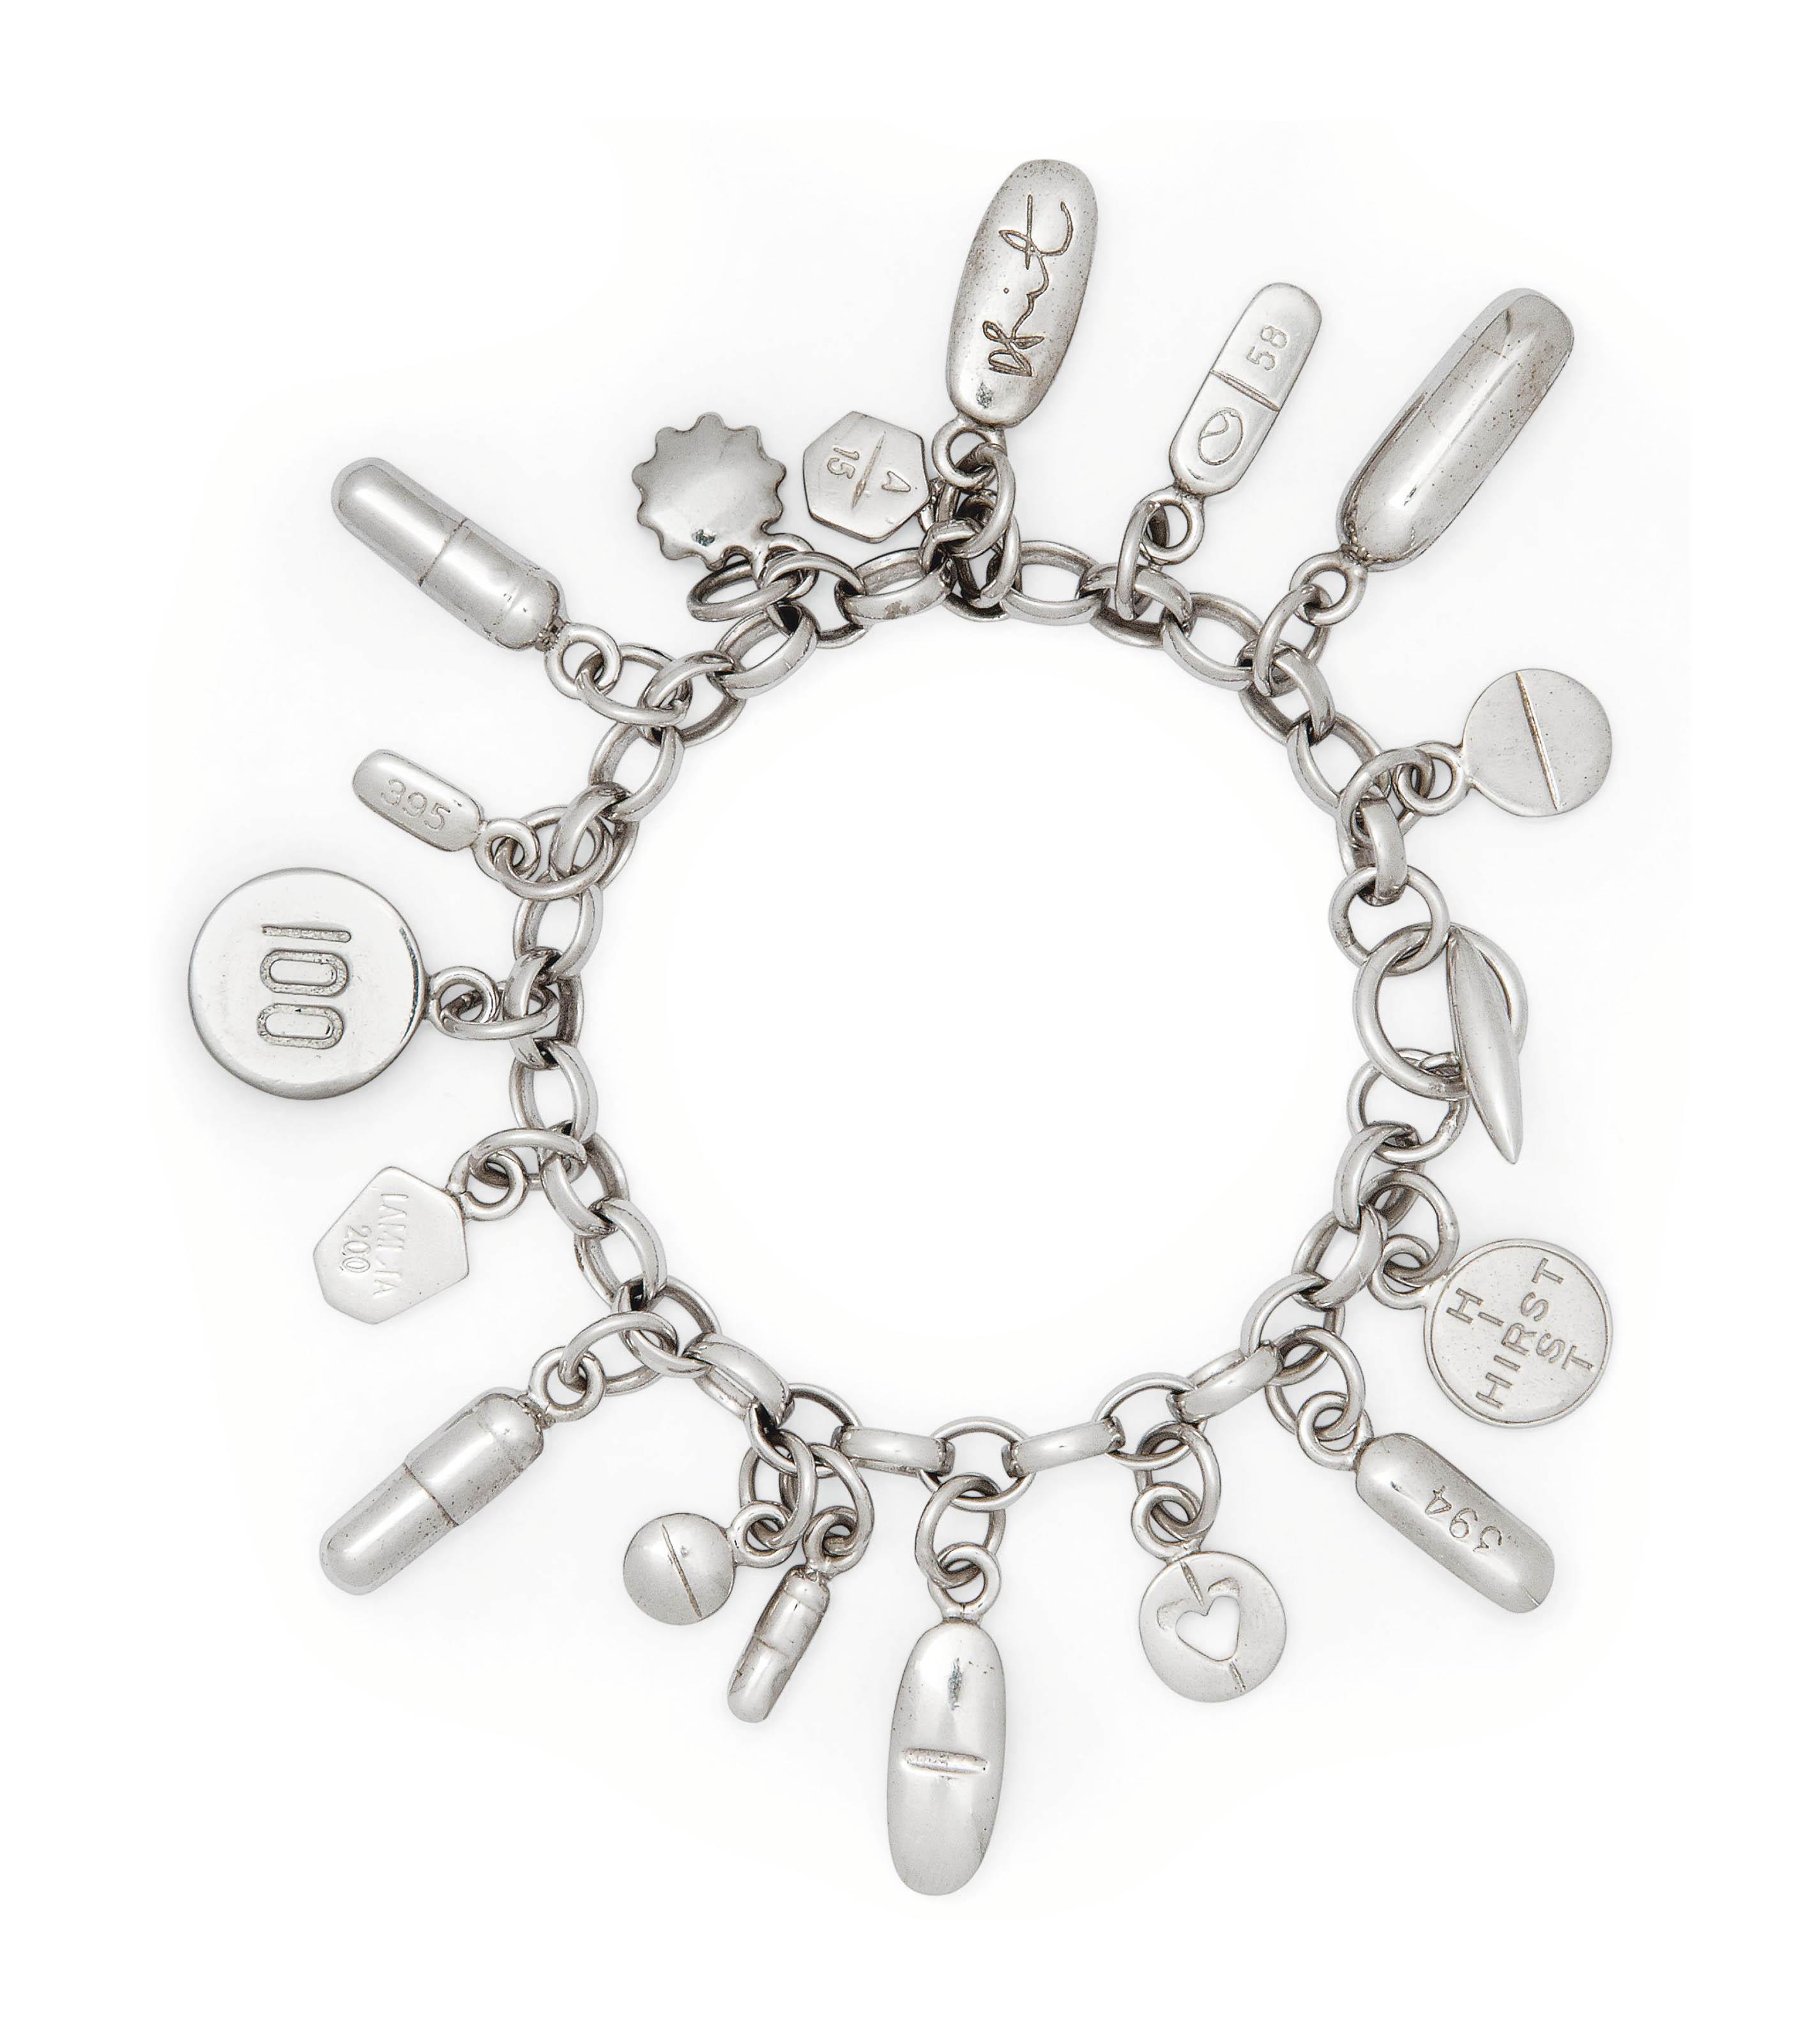 psychiatrist PillBling pharmacist Ambien Zoloft |Adderall Xanax medical bracelet Valium Klonopin nurse Pill bracelet